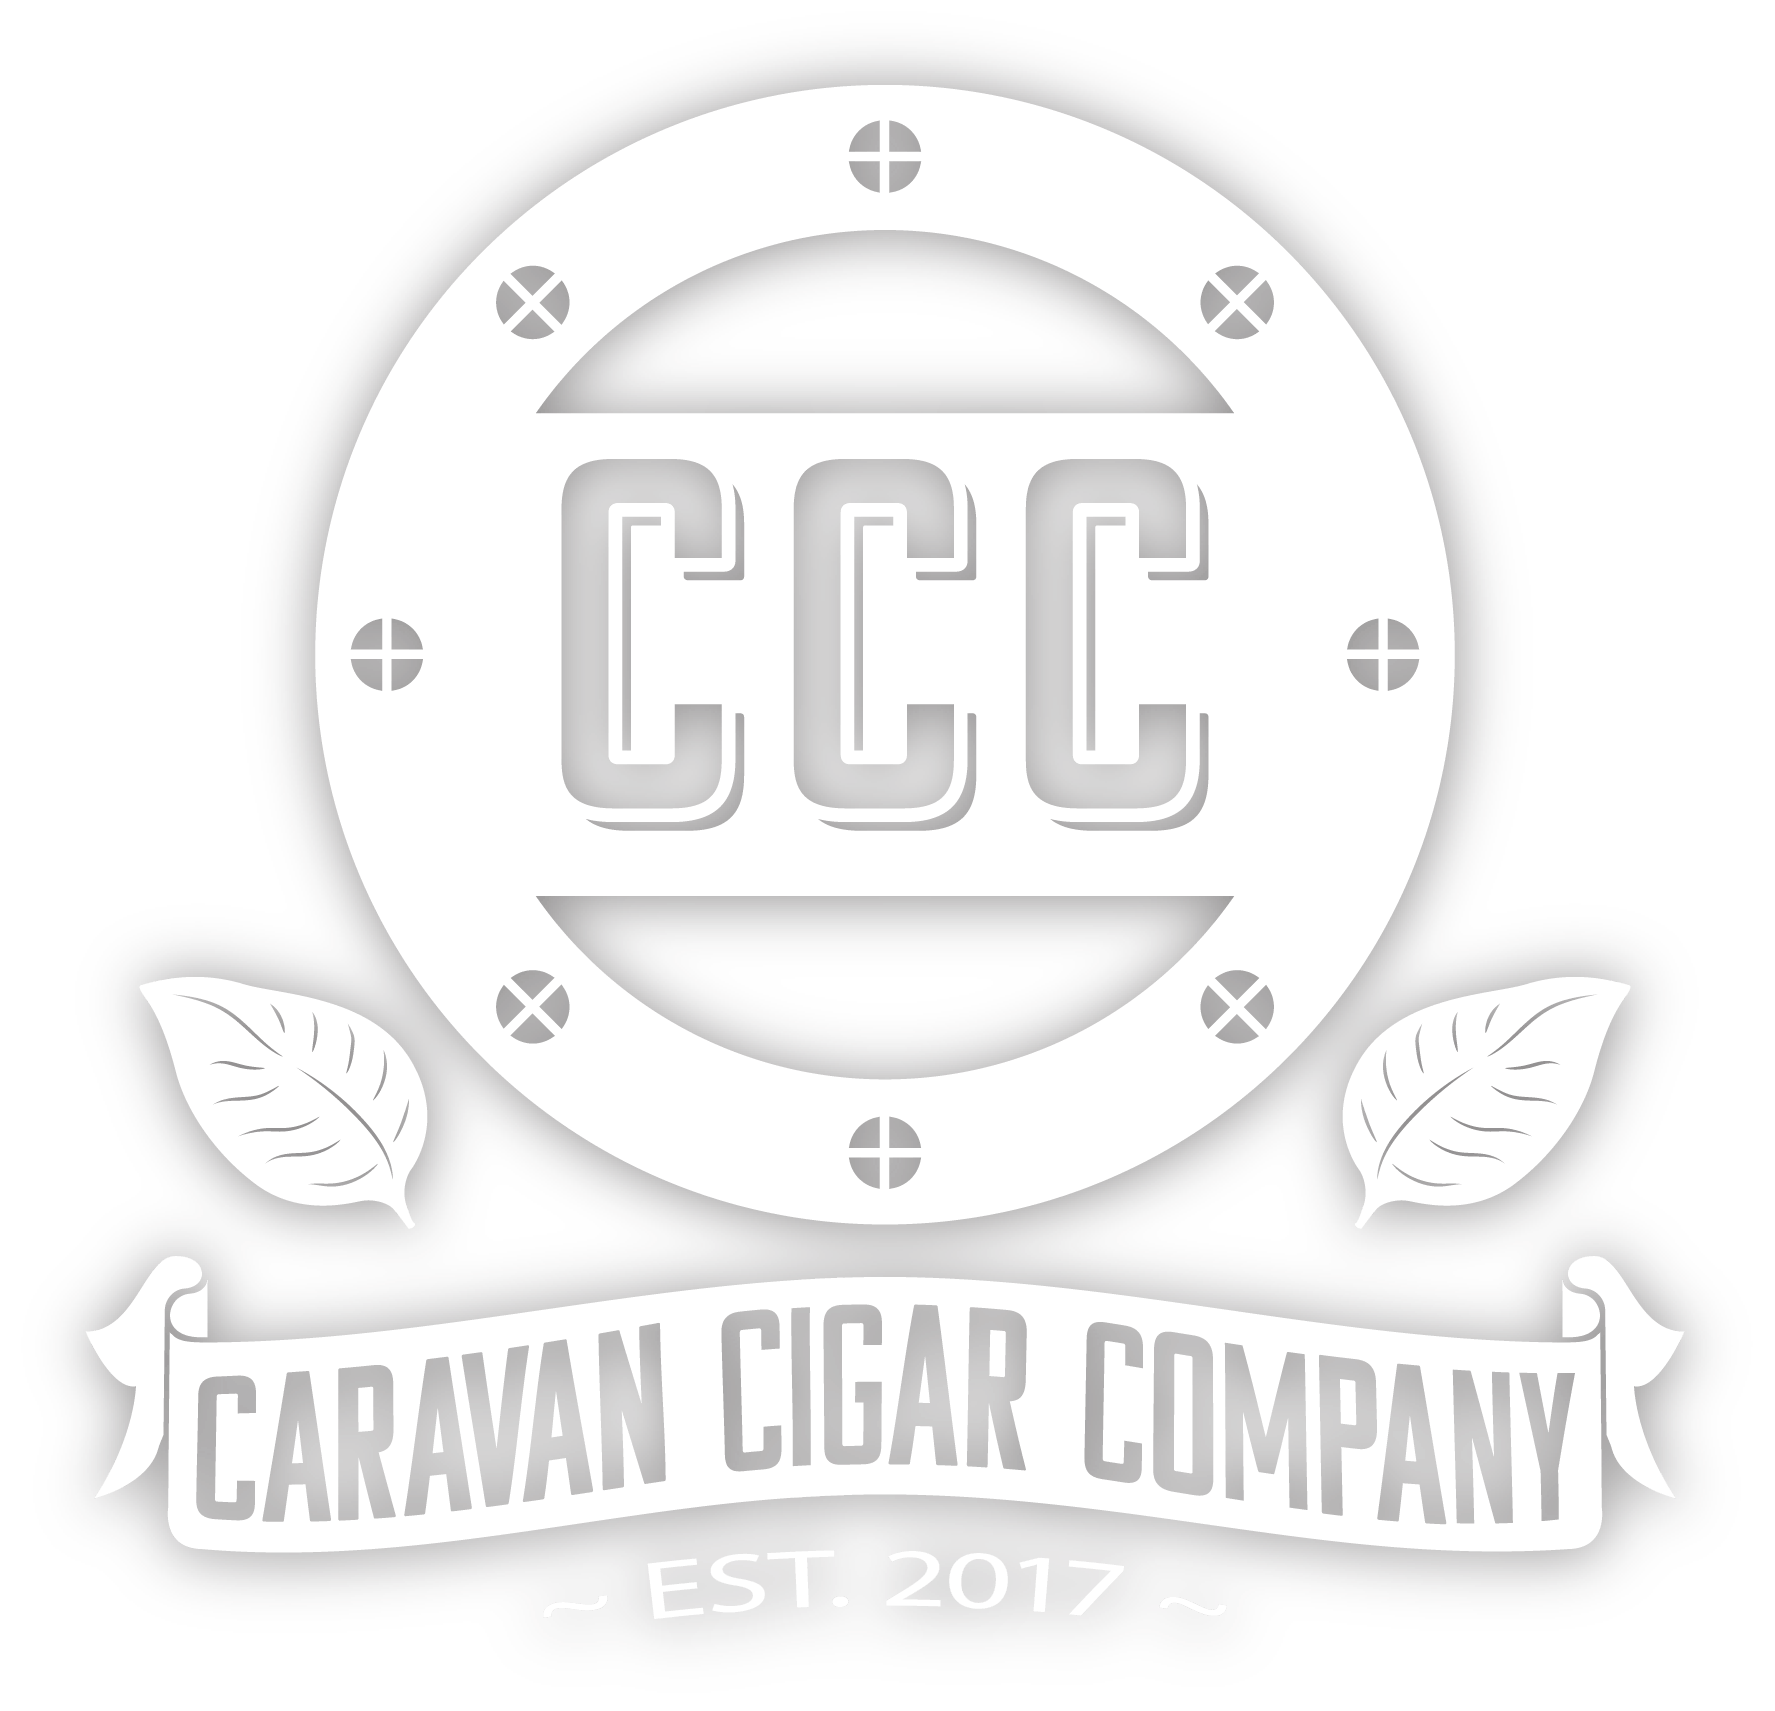 CARAVAN CIGAR COMPANY